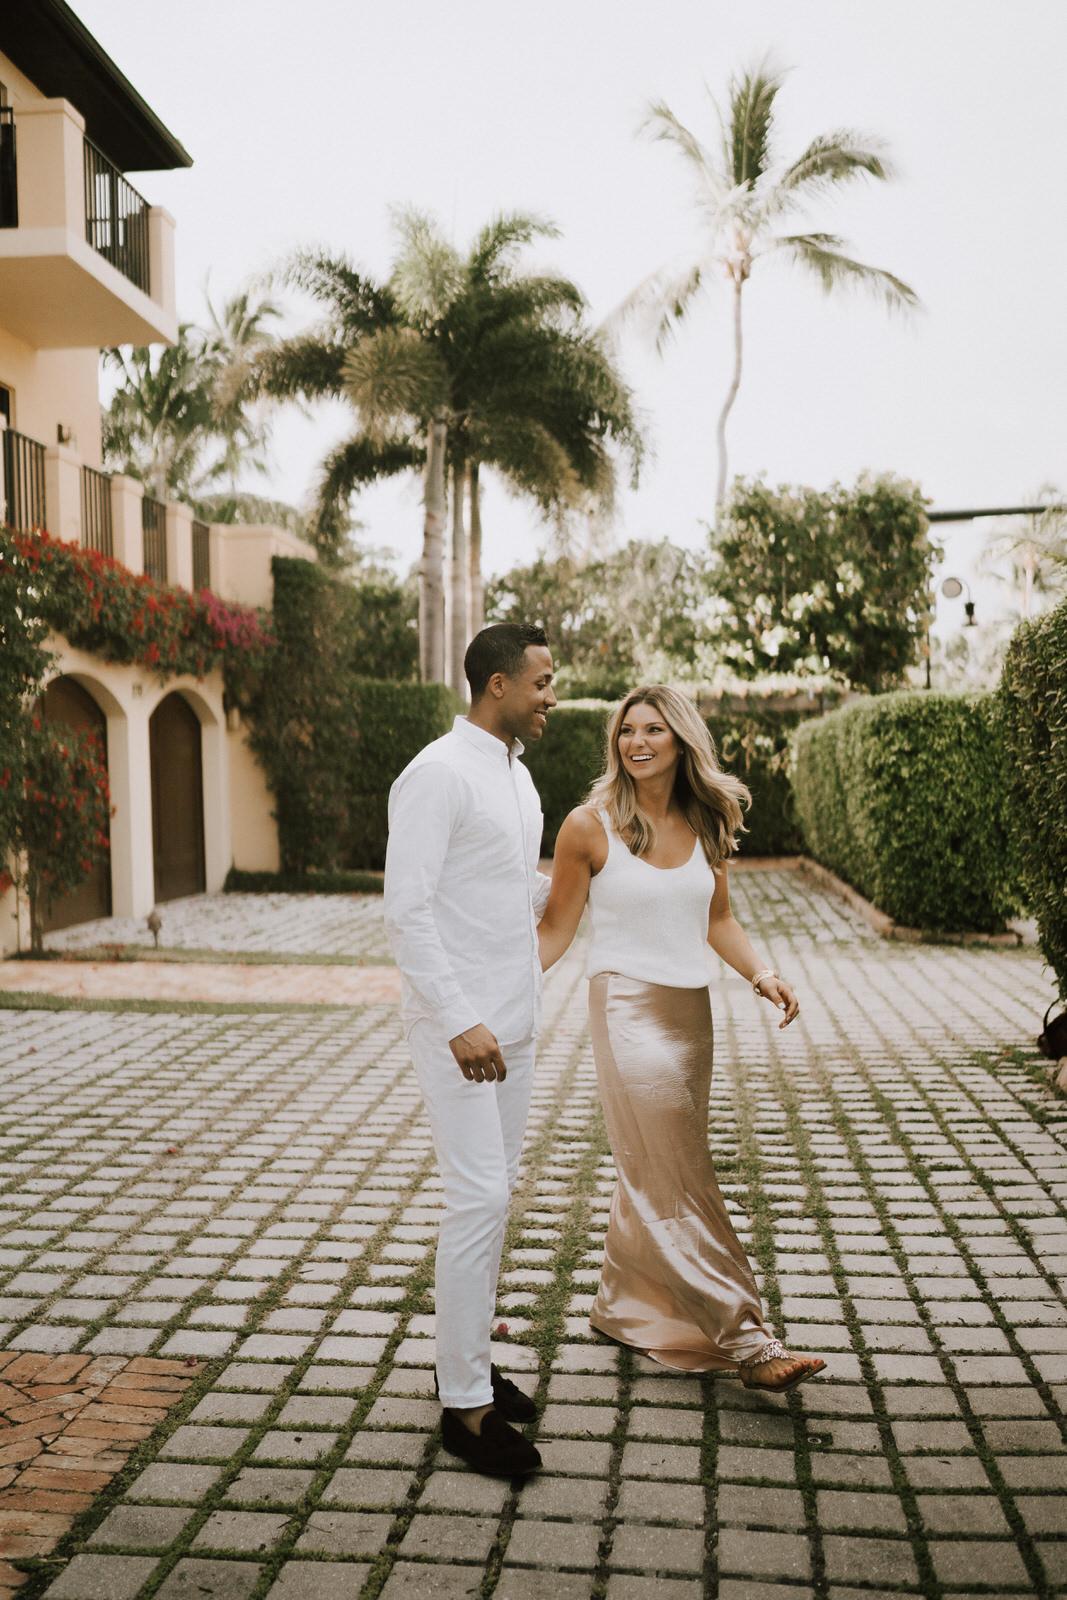 Naples 5th Ave Engagement Photos- Michelle Gonzalez Photography- Michele + Troy-2.JPG